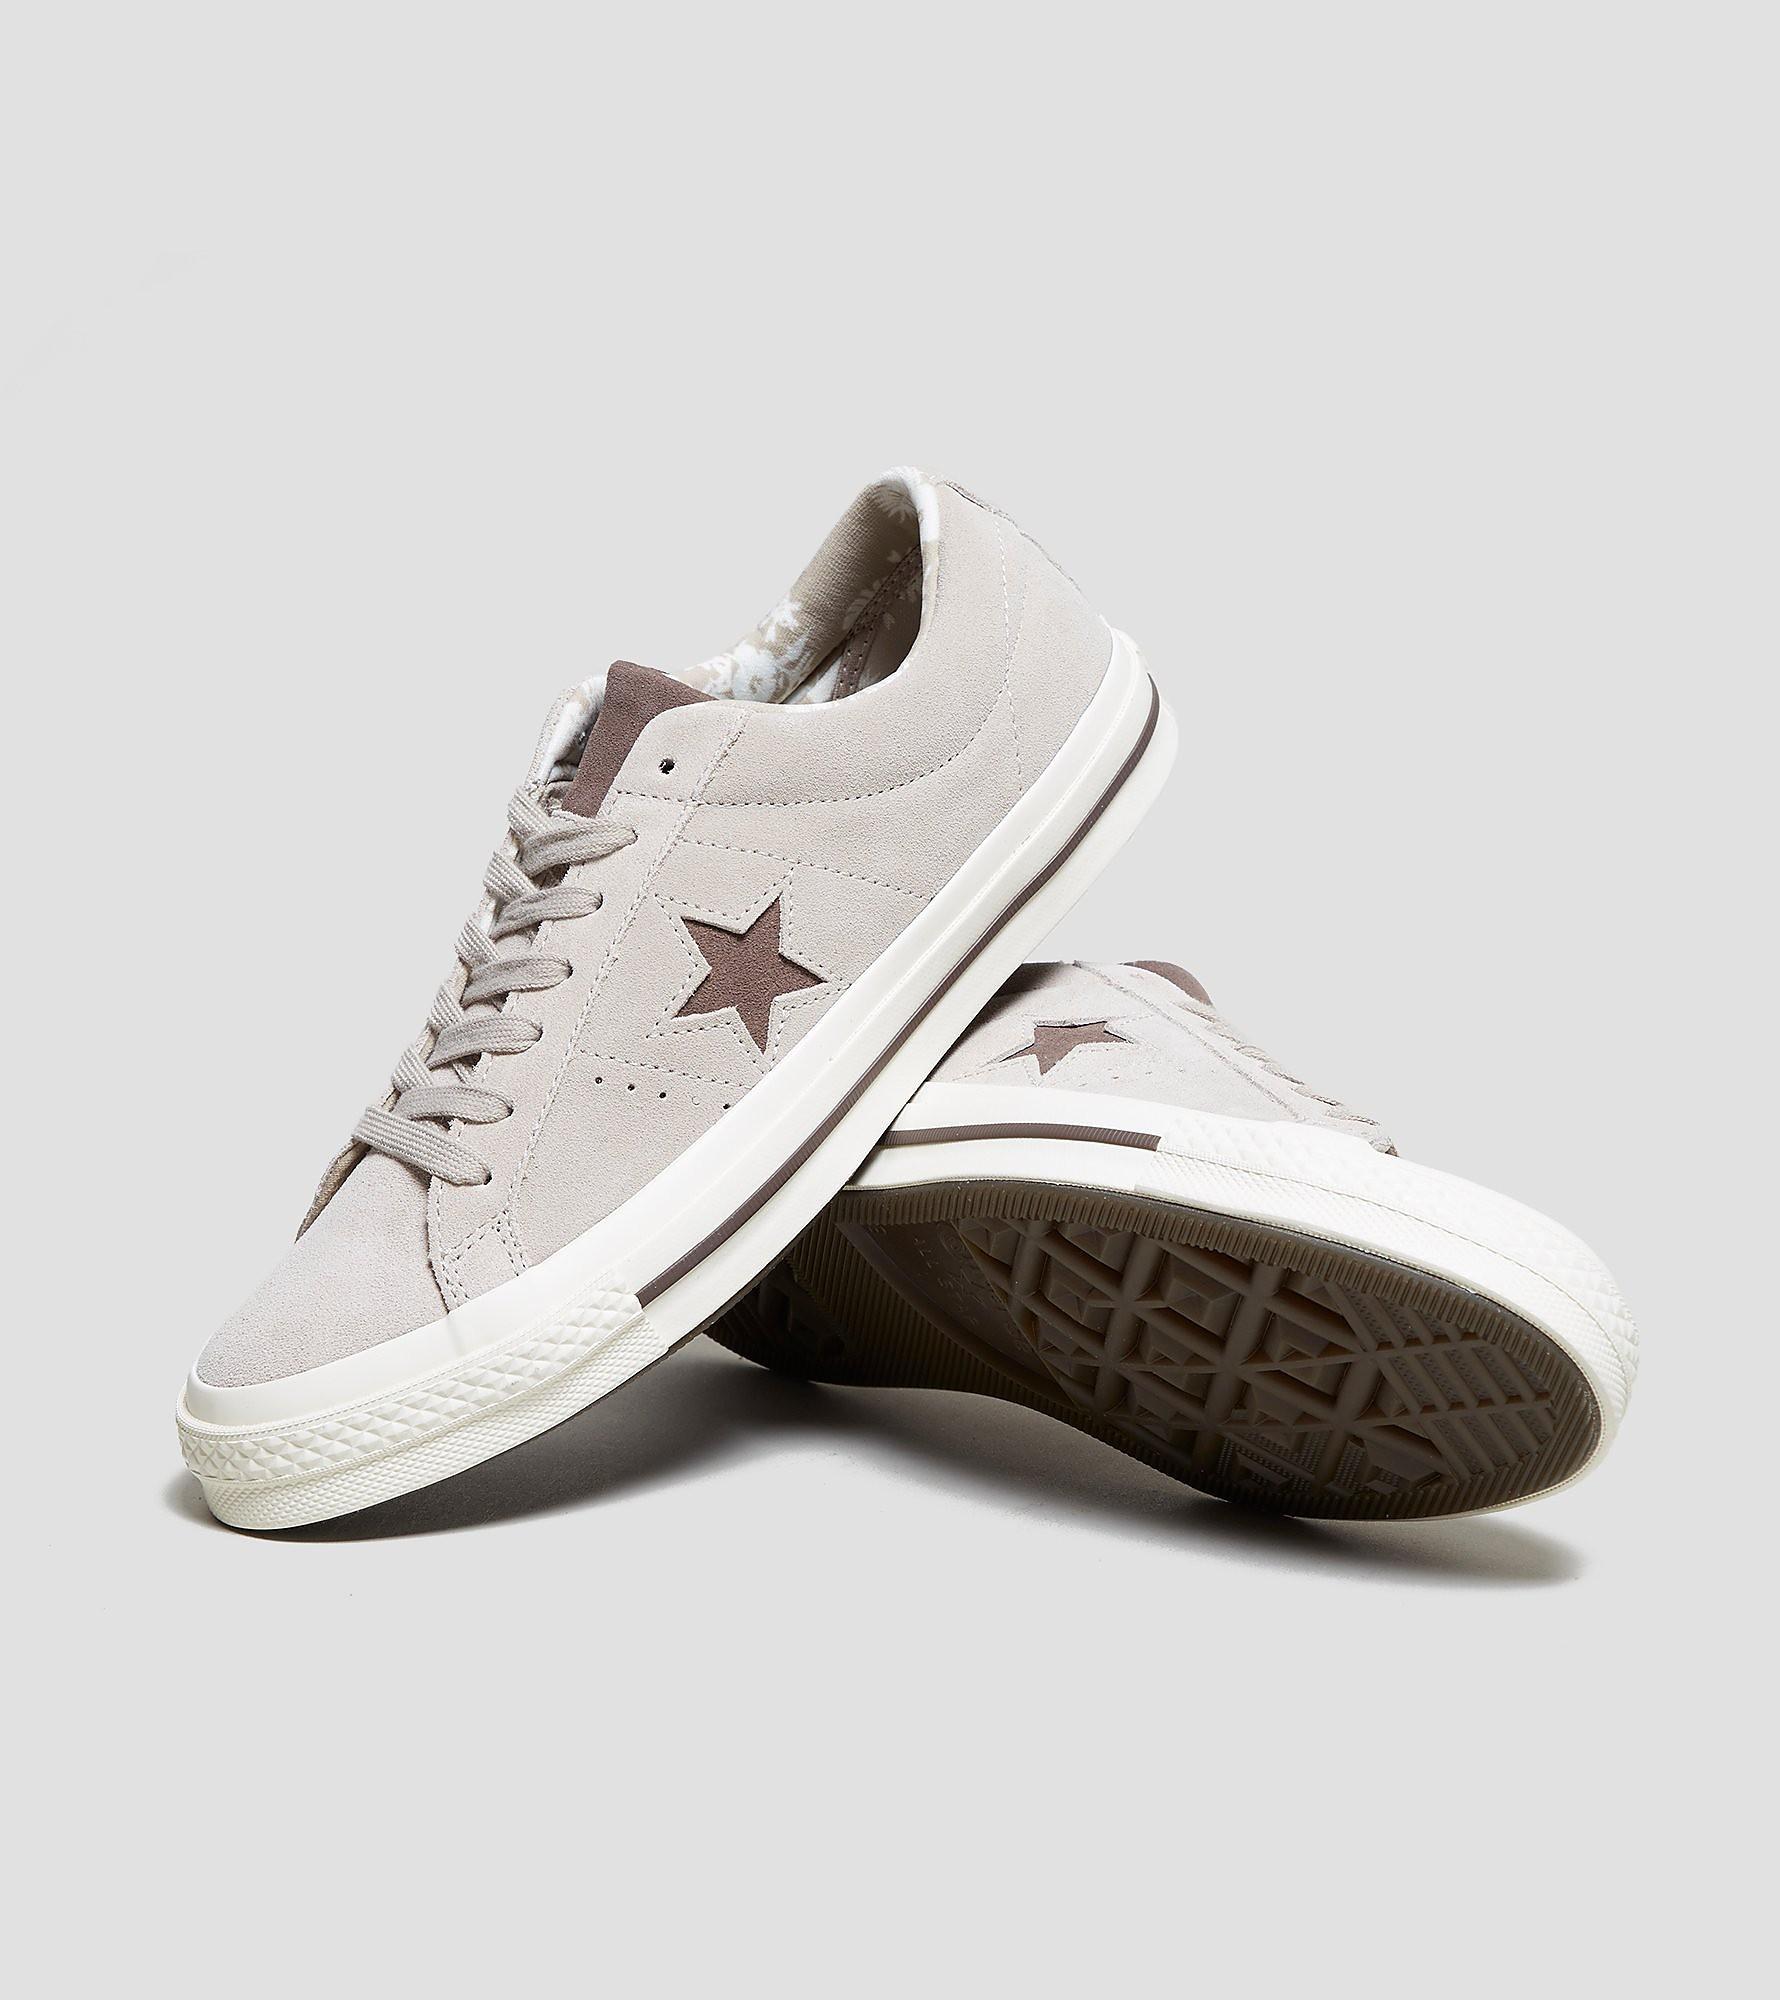 Converse One Star 74